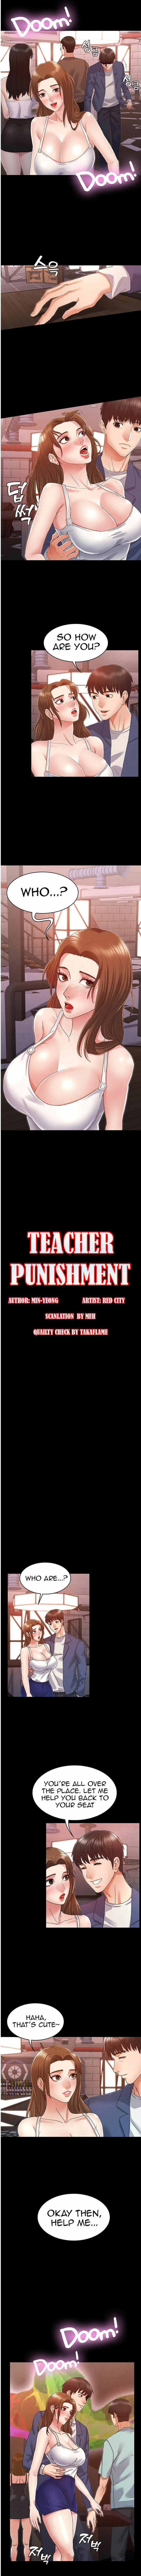 TEACHER PUNISHMENT Ch.1-16 11